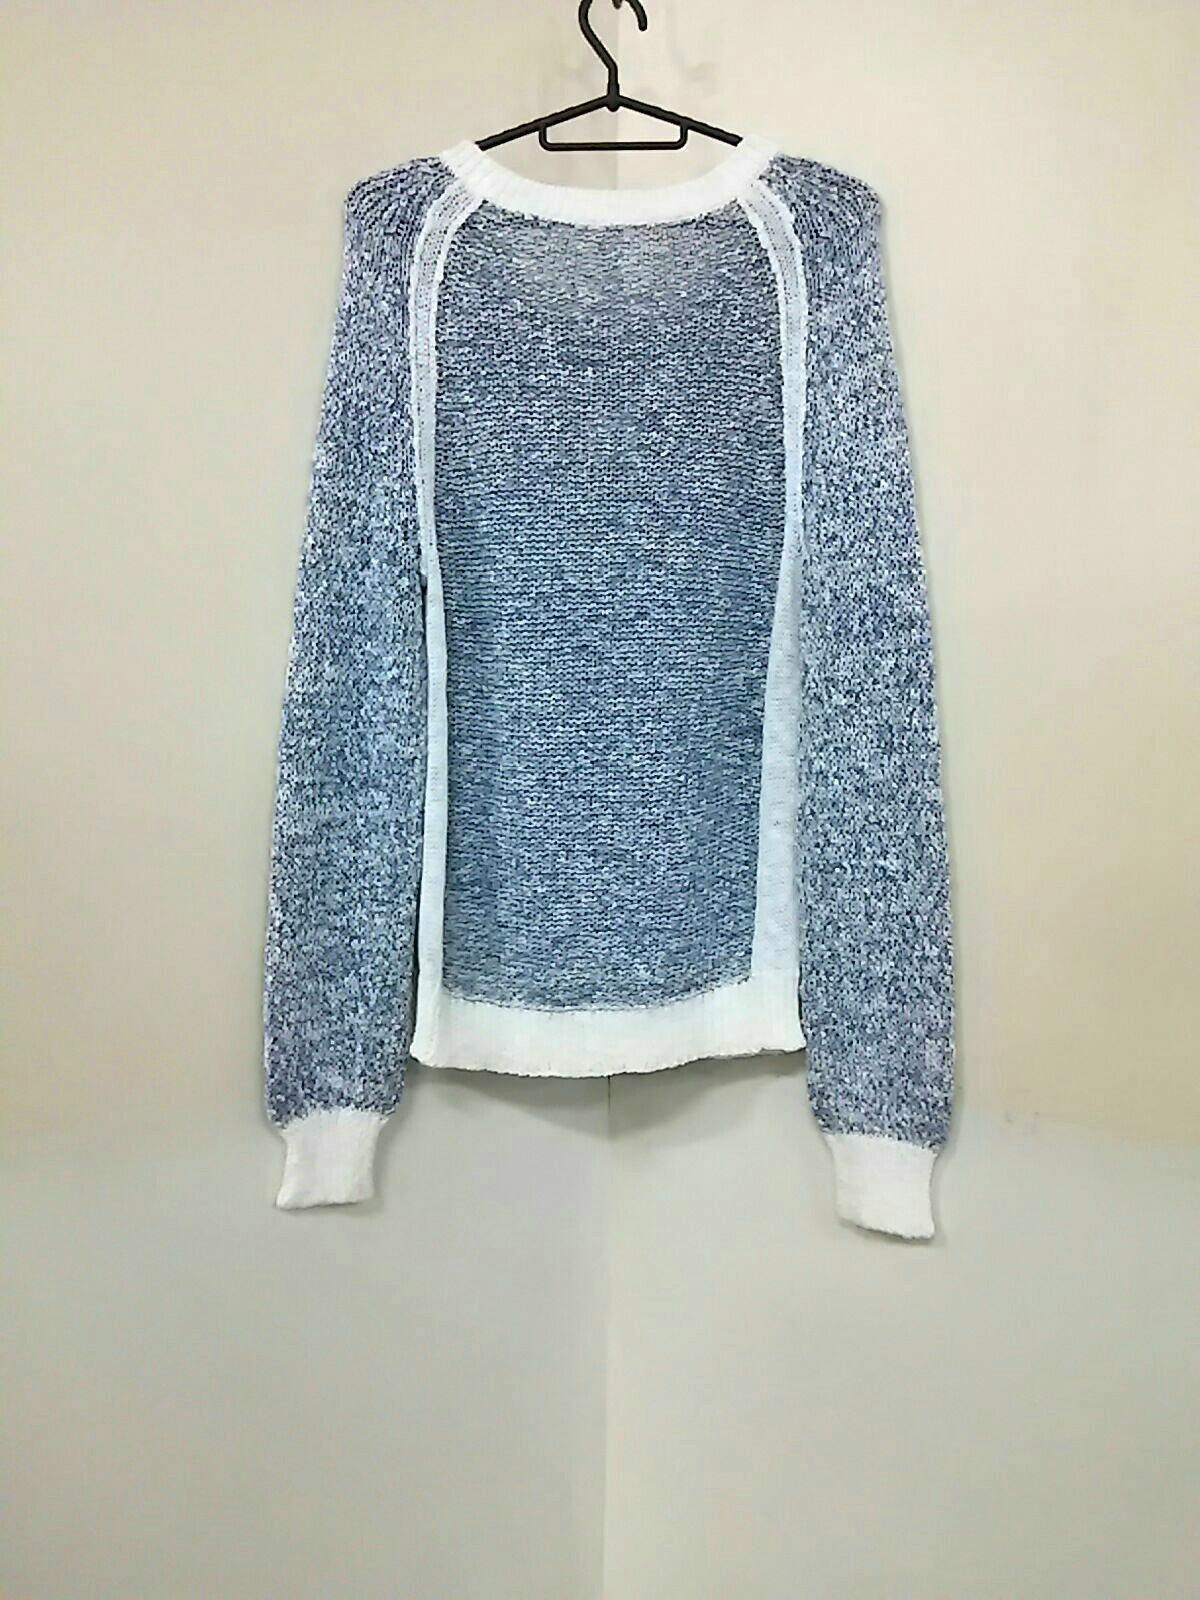 SI-IAE(シャエ)のセーター